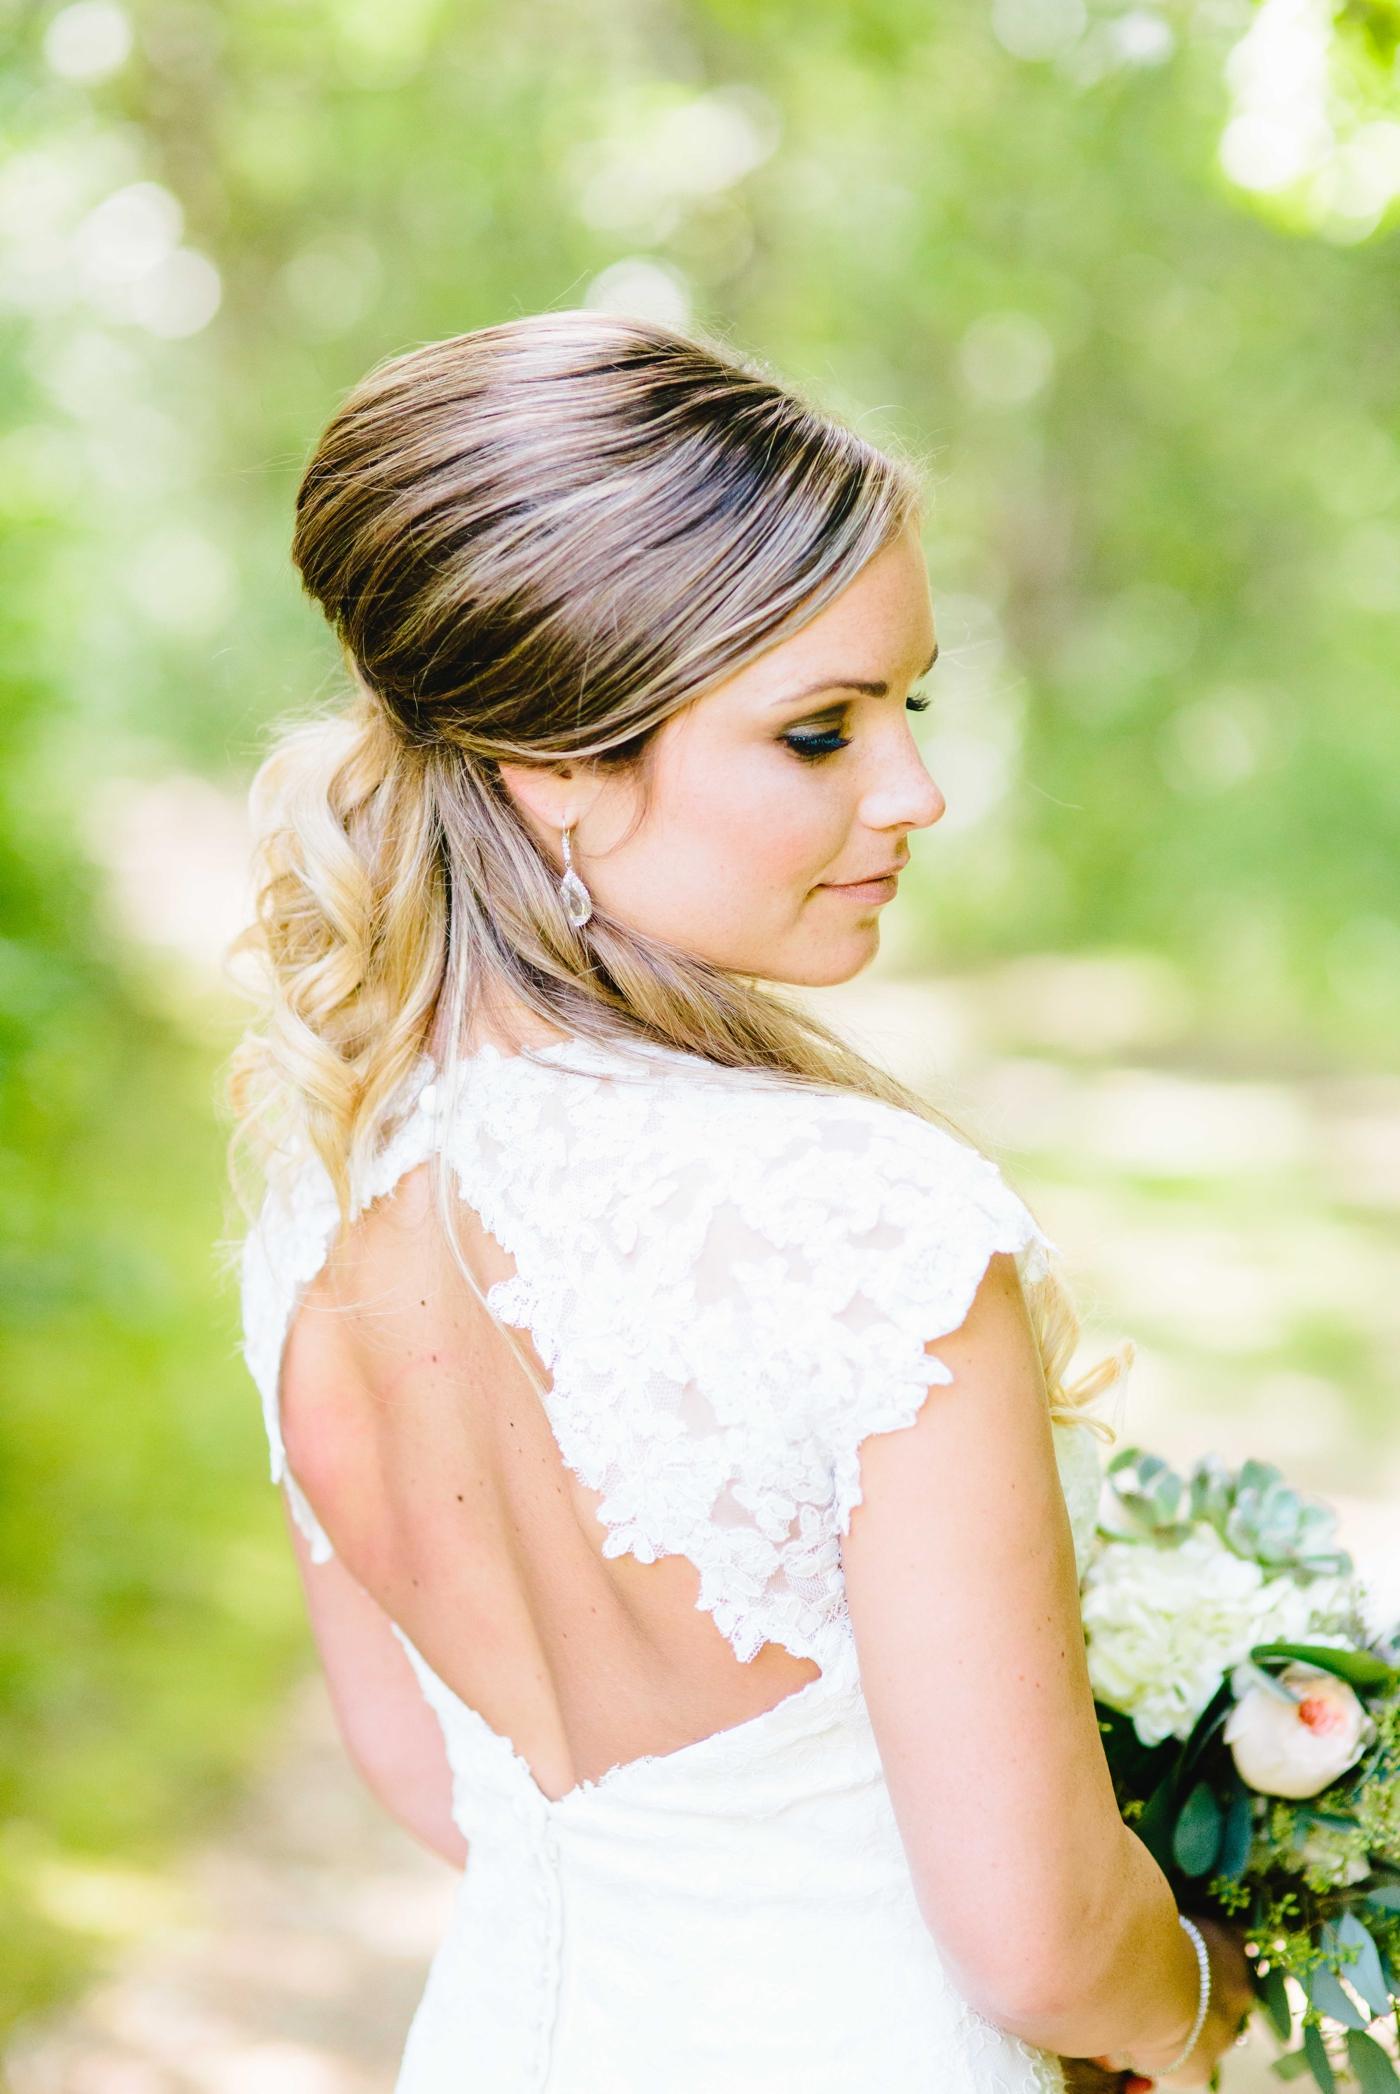 chicago-fine-art-wedding-photography-chiapetta10